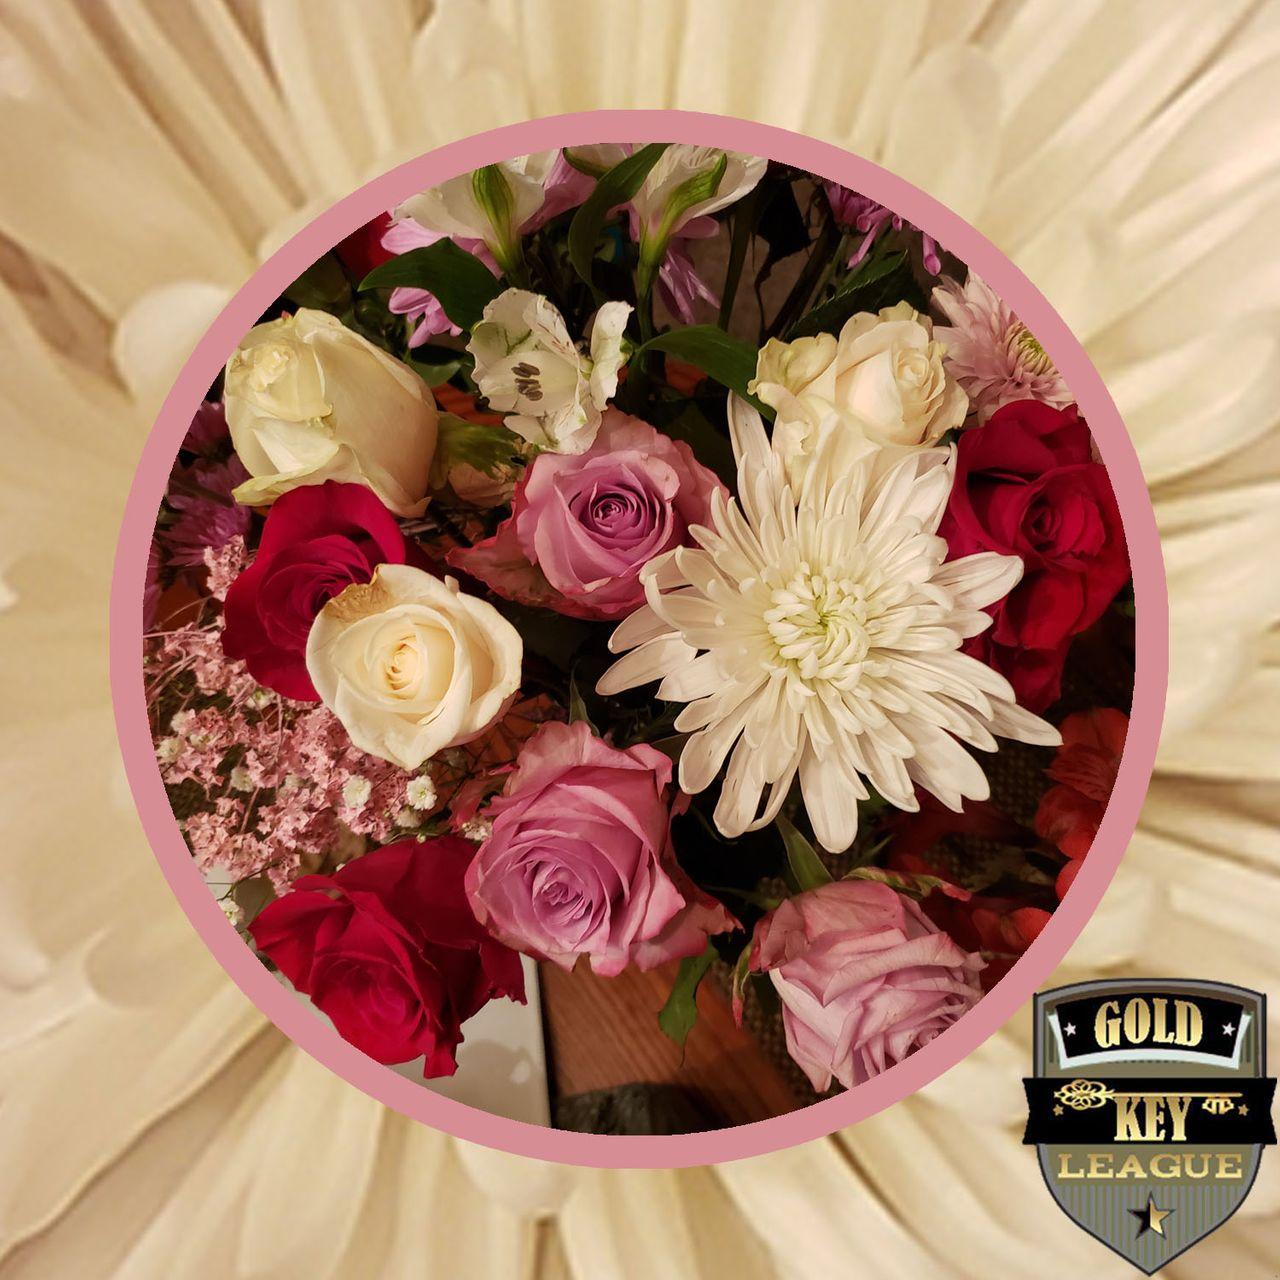 GK_PC_FLOWERS_VER185_HIVE_01.jpg